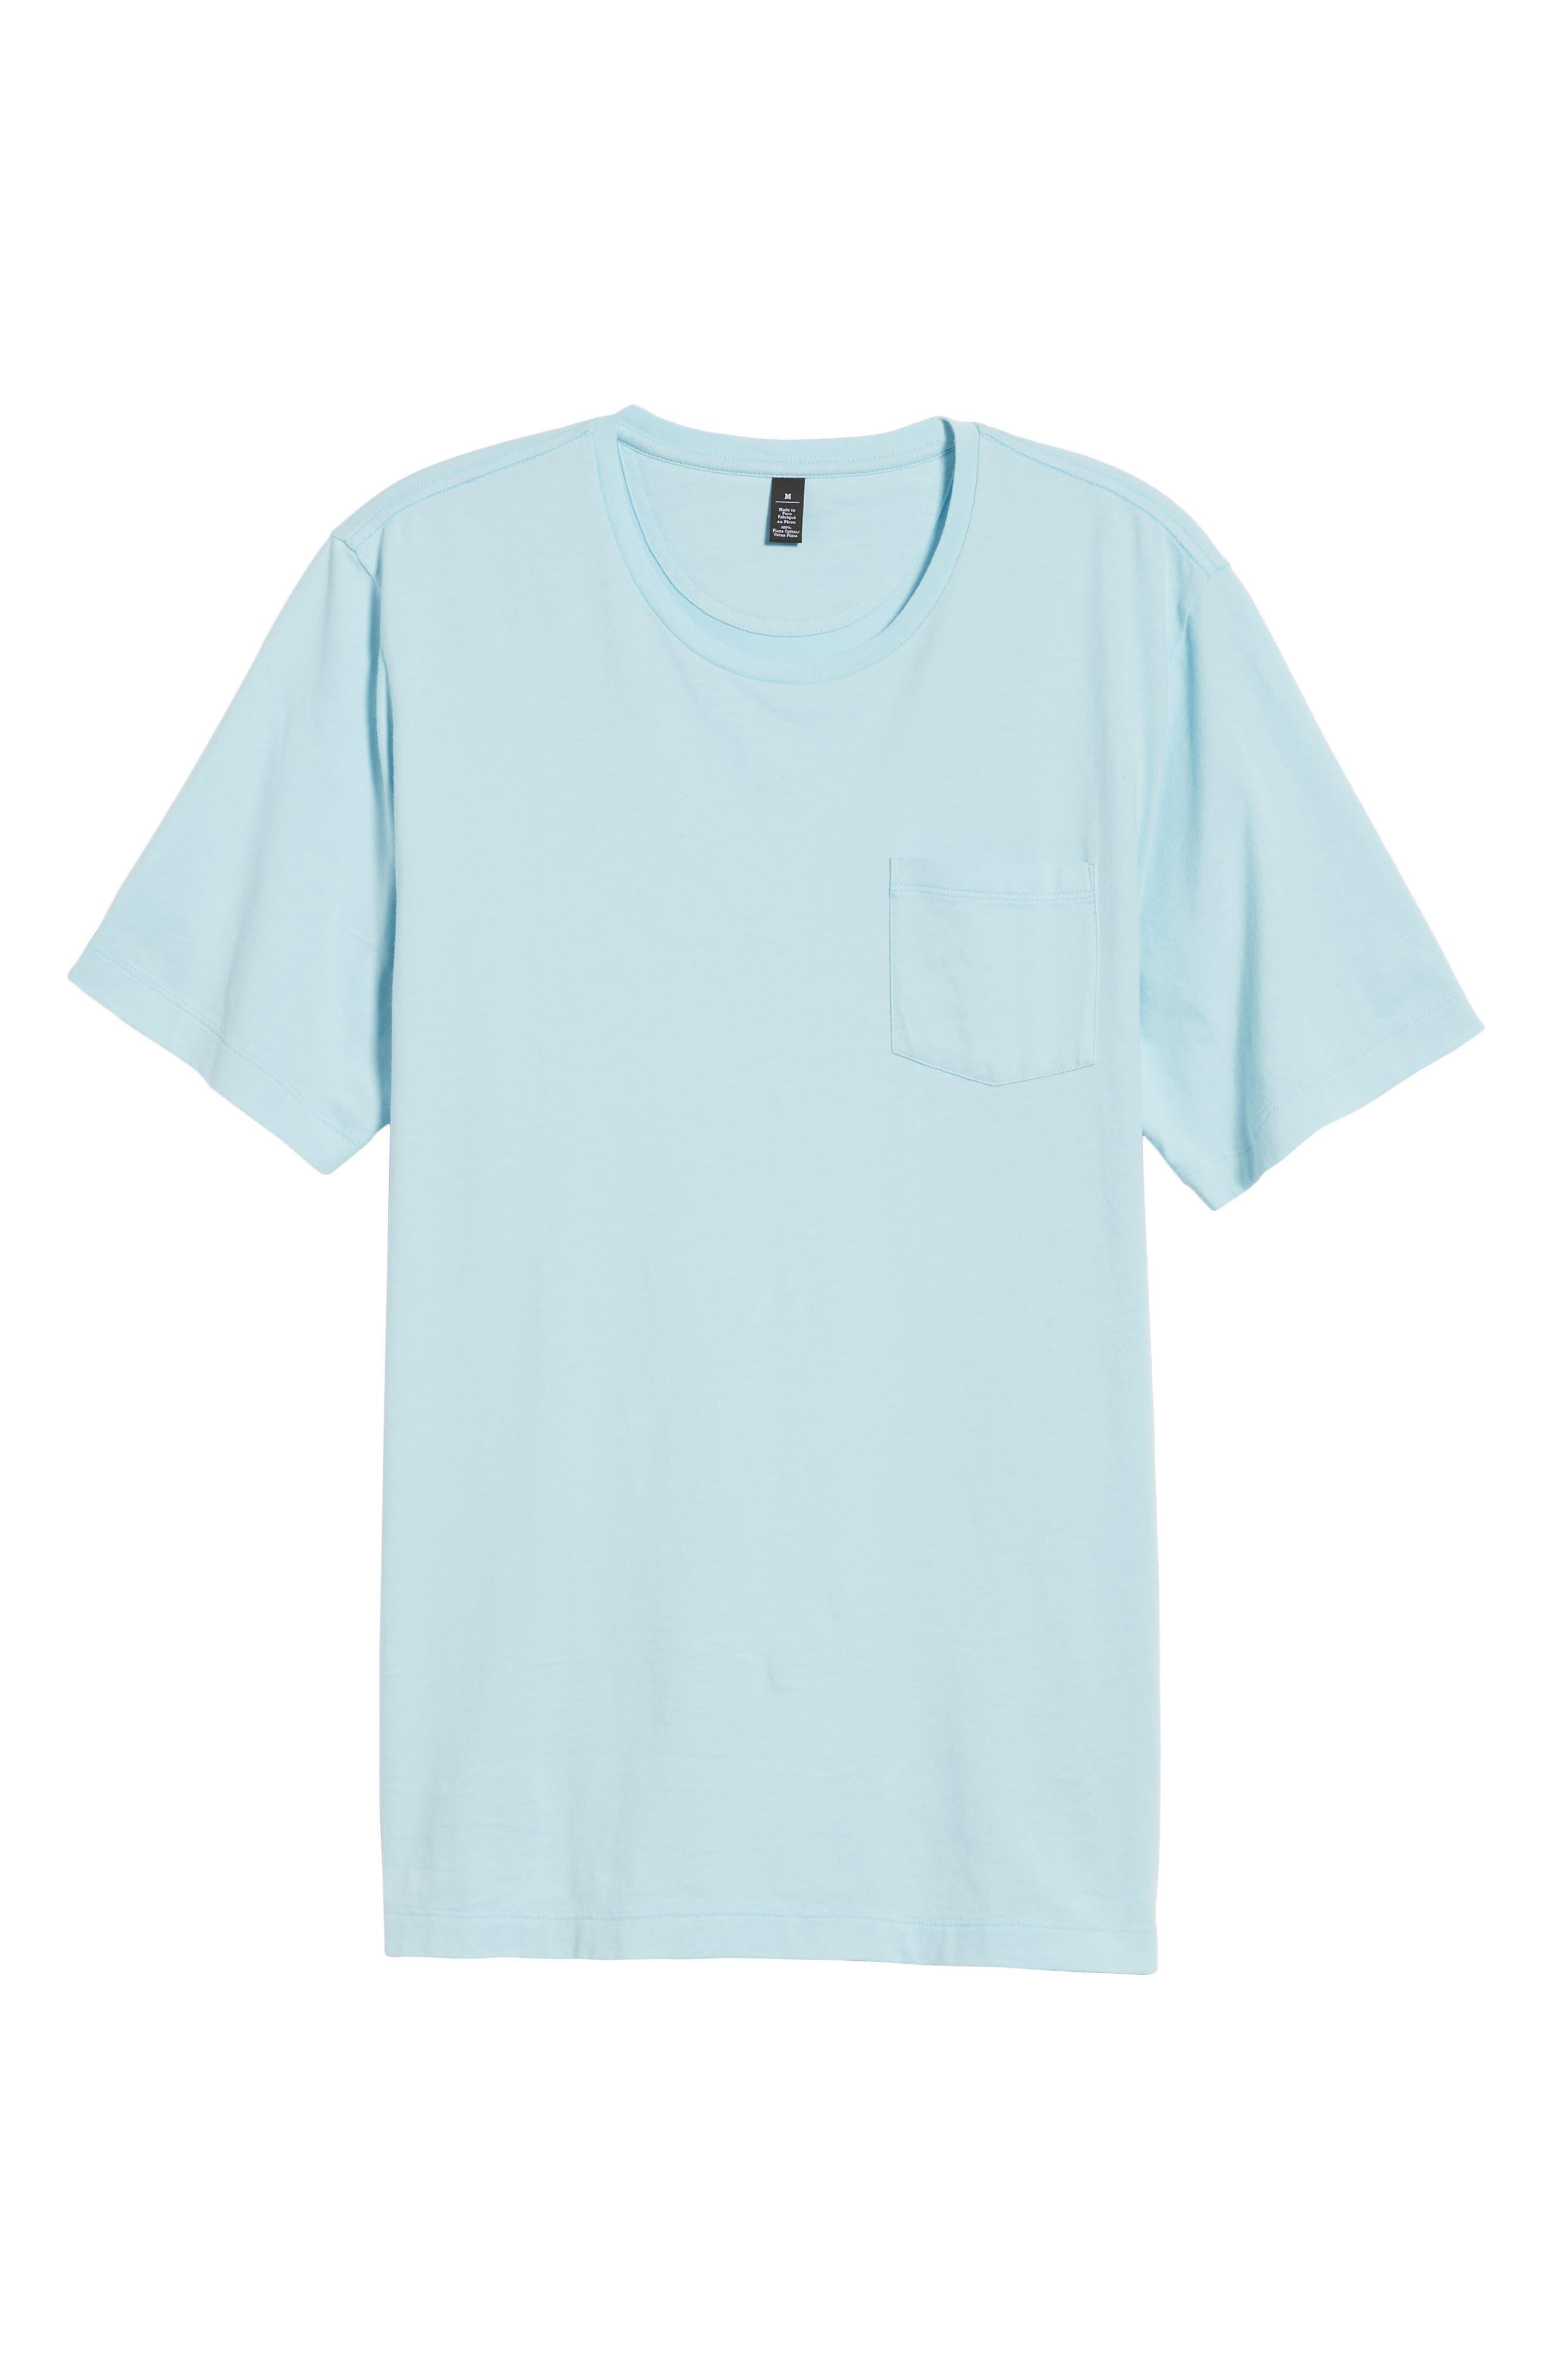 Brushed Pima Cotton T-Shirt,                             Alternate thumbnail 6, color,                             Blue Orydalis